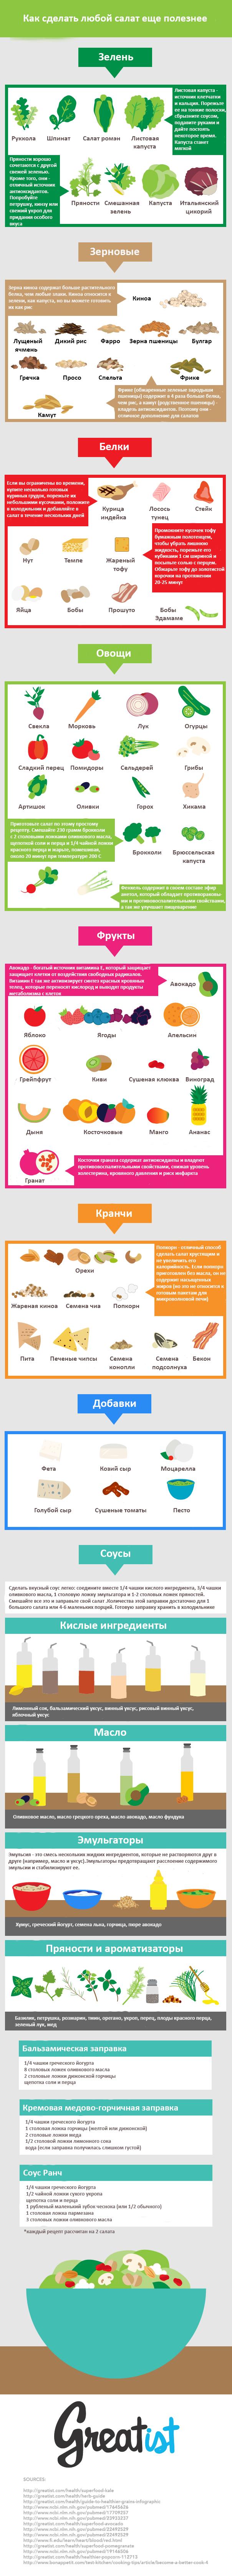 How to Make a Healthier Salad